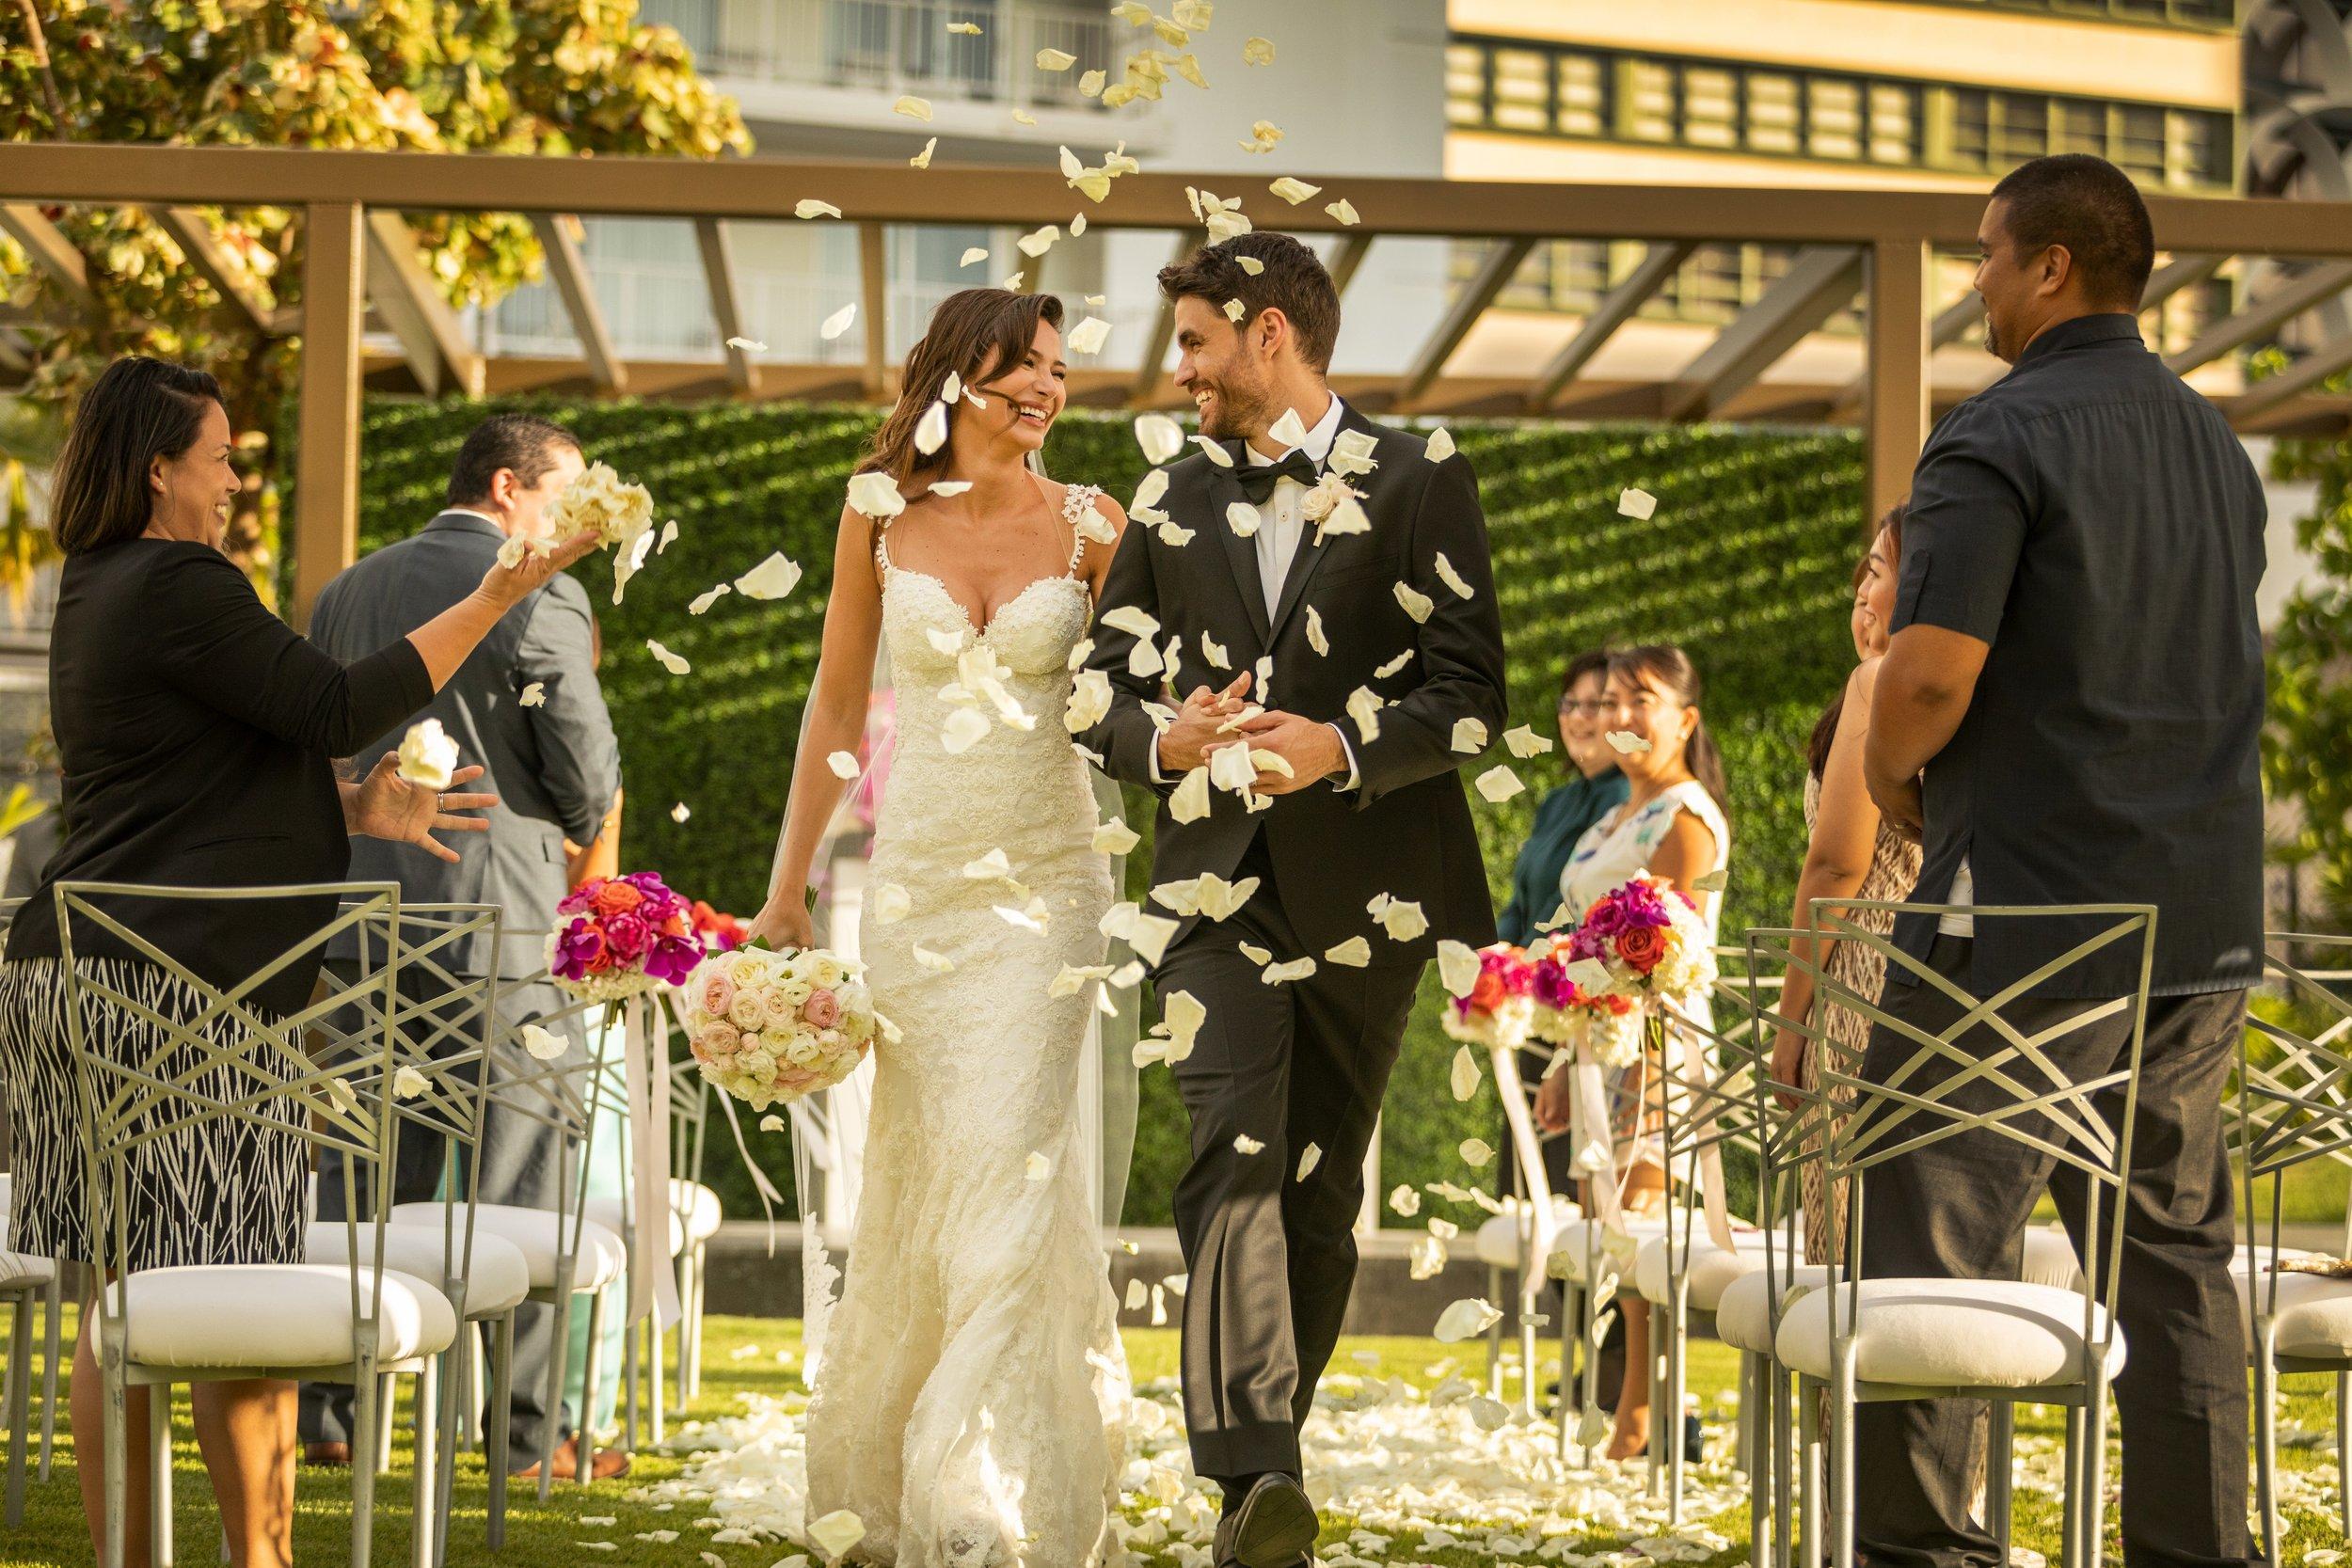 Lifestyle - Wedding Ceremony - 1 70.jpg